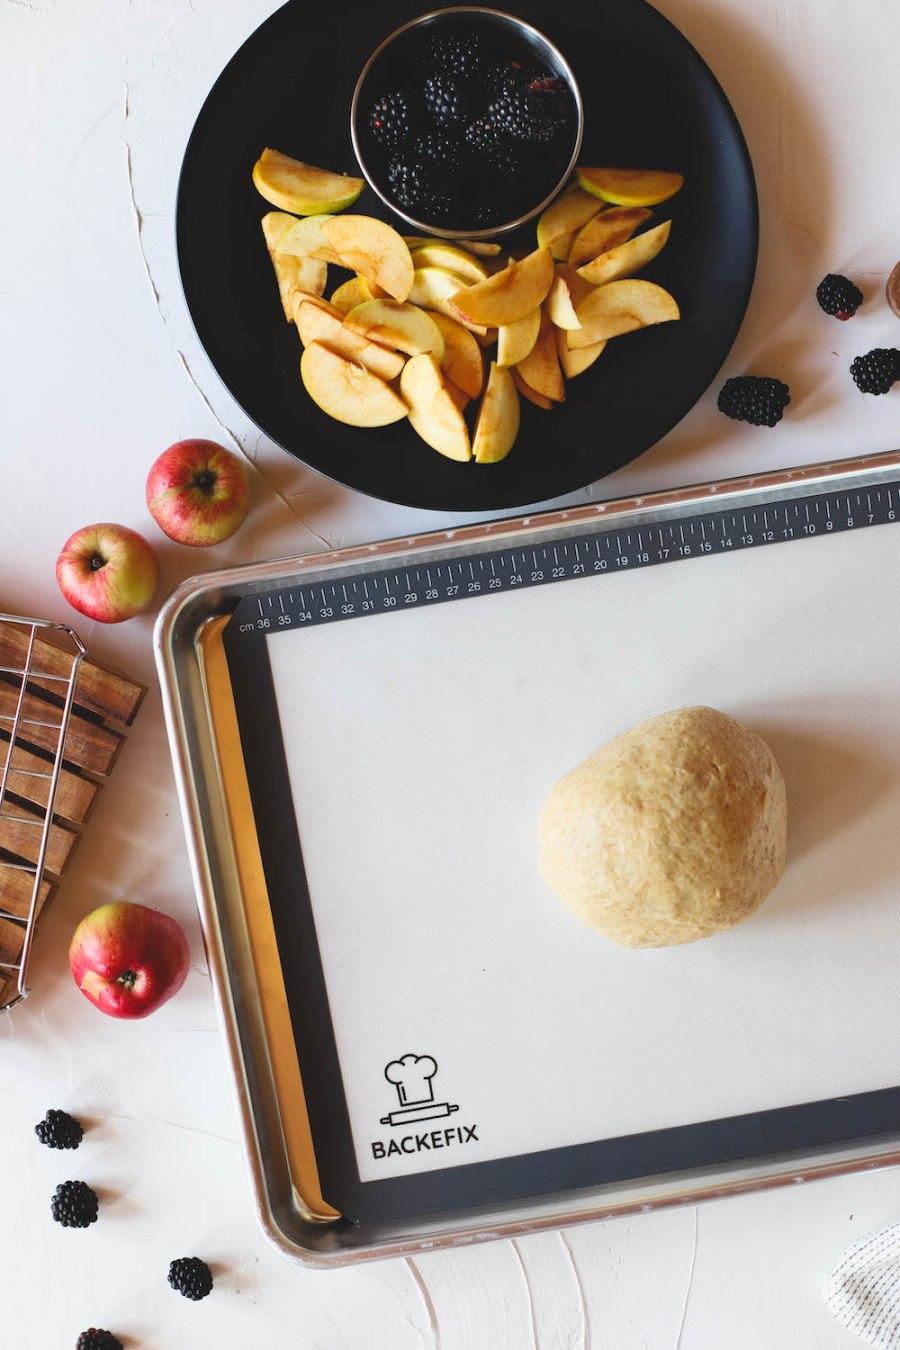 Backefix Backmatte Teig Äpfel